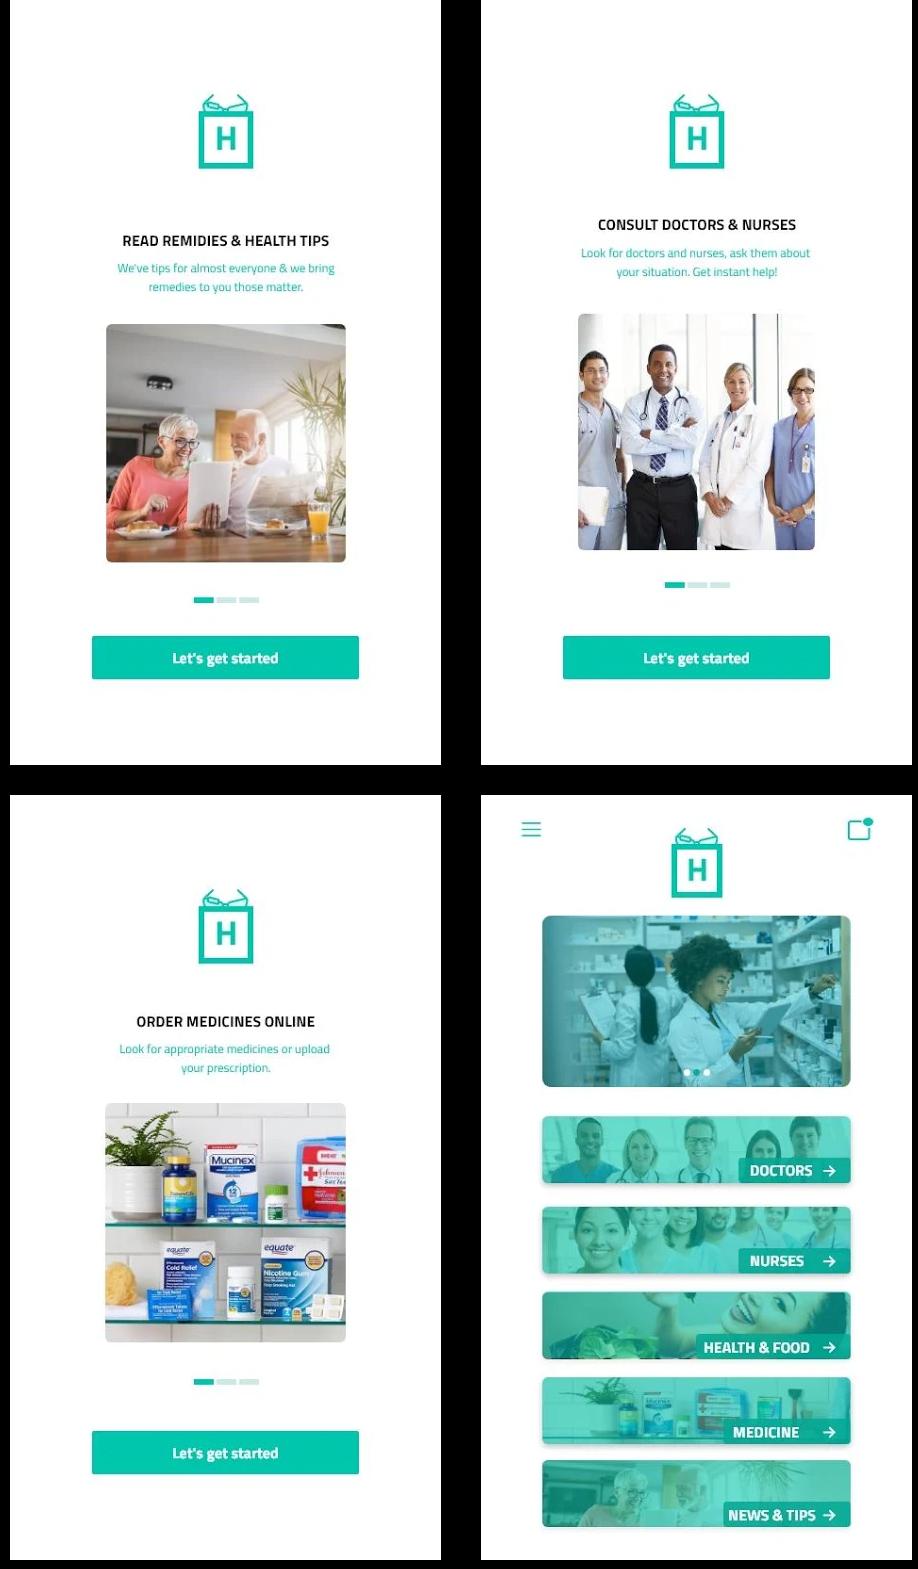 Sheharyar Pharmacy and Doctor | Images 2